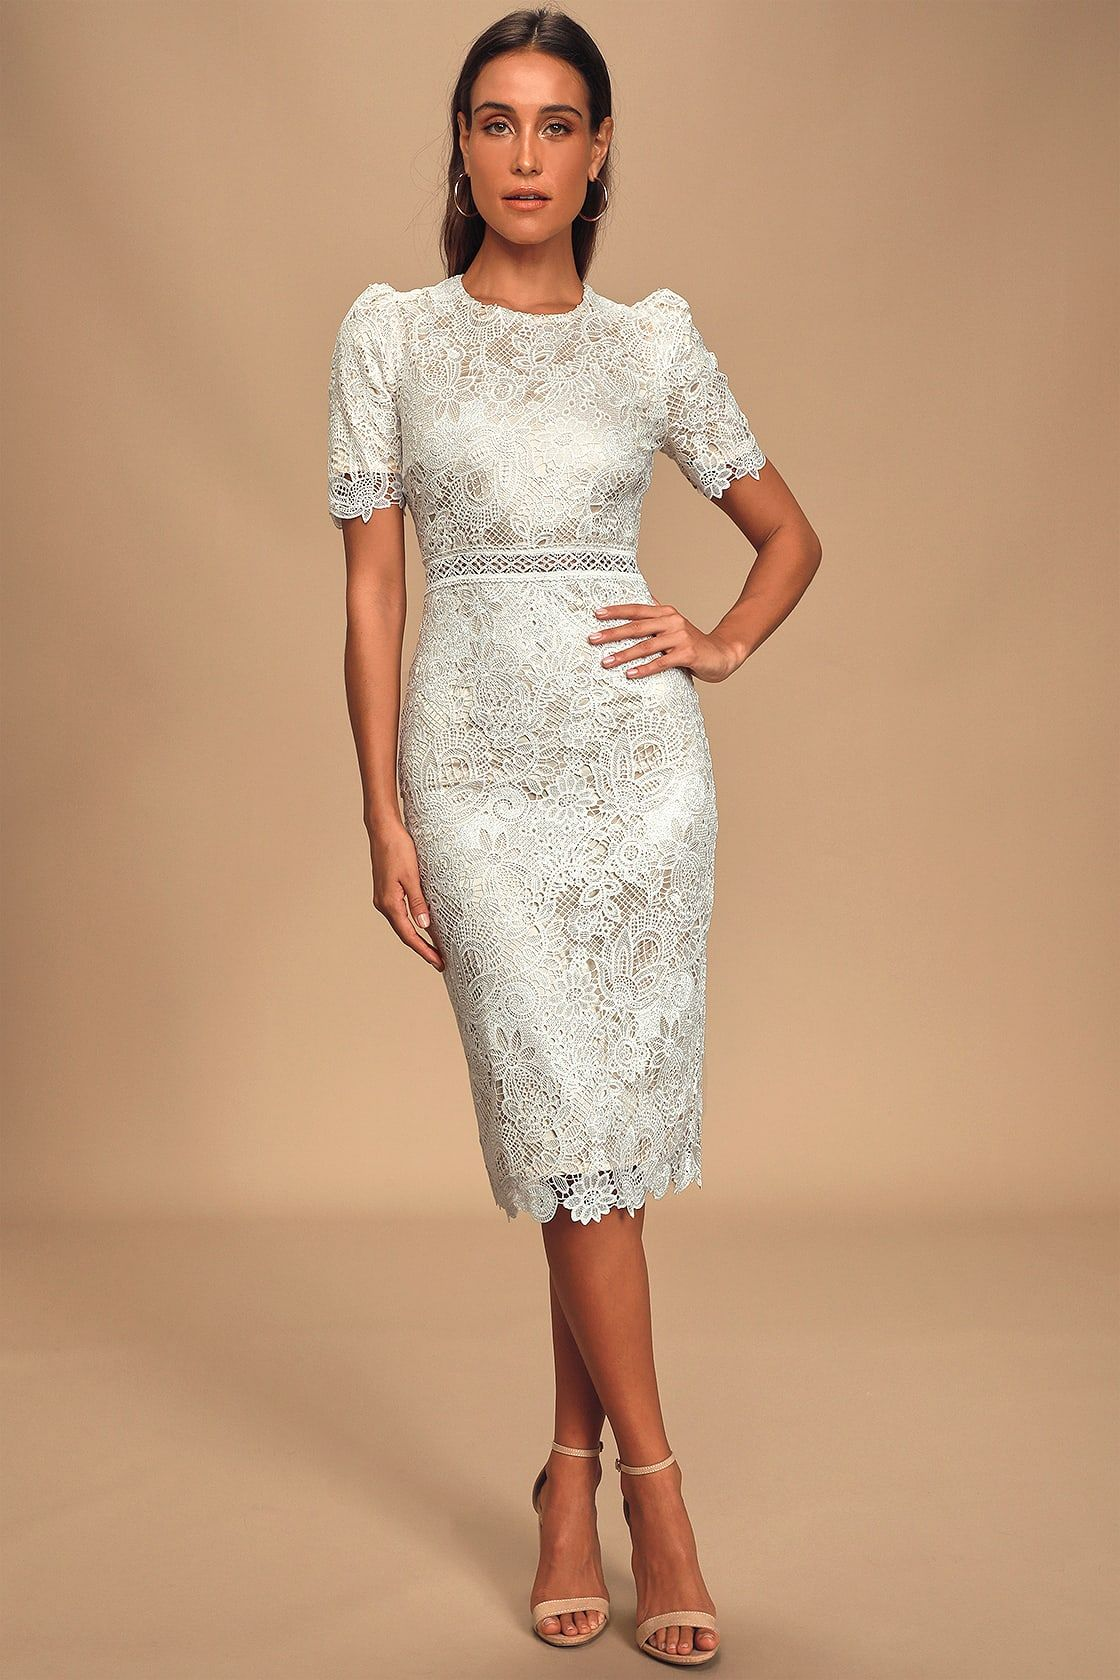 Off White Crochet Lace Short Sleeve Midi Dress Midi Short Sleeve Dress Off White Lace Dress White Lace Midi Dress [ 1680 x 1120 Pixel ]